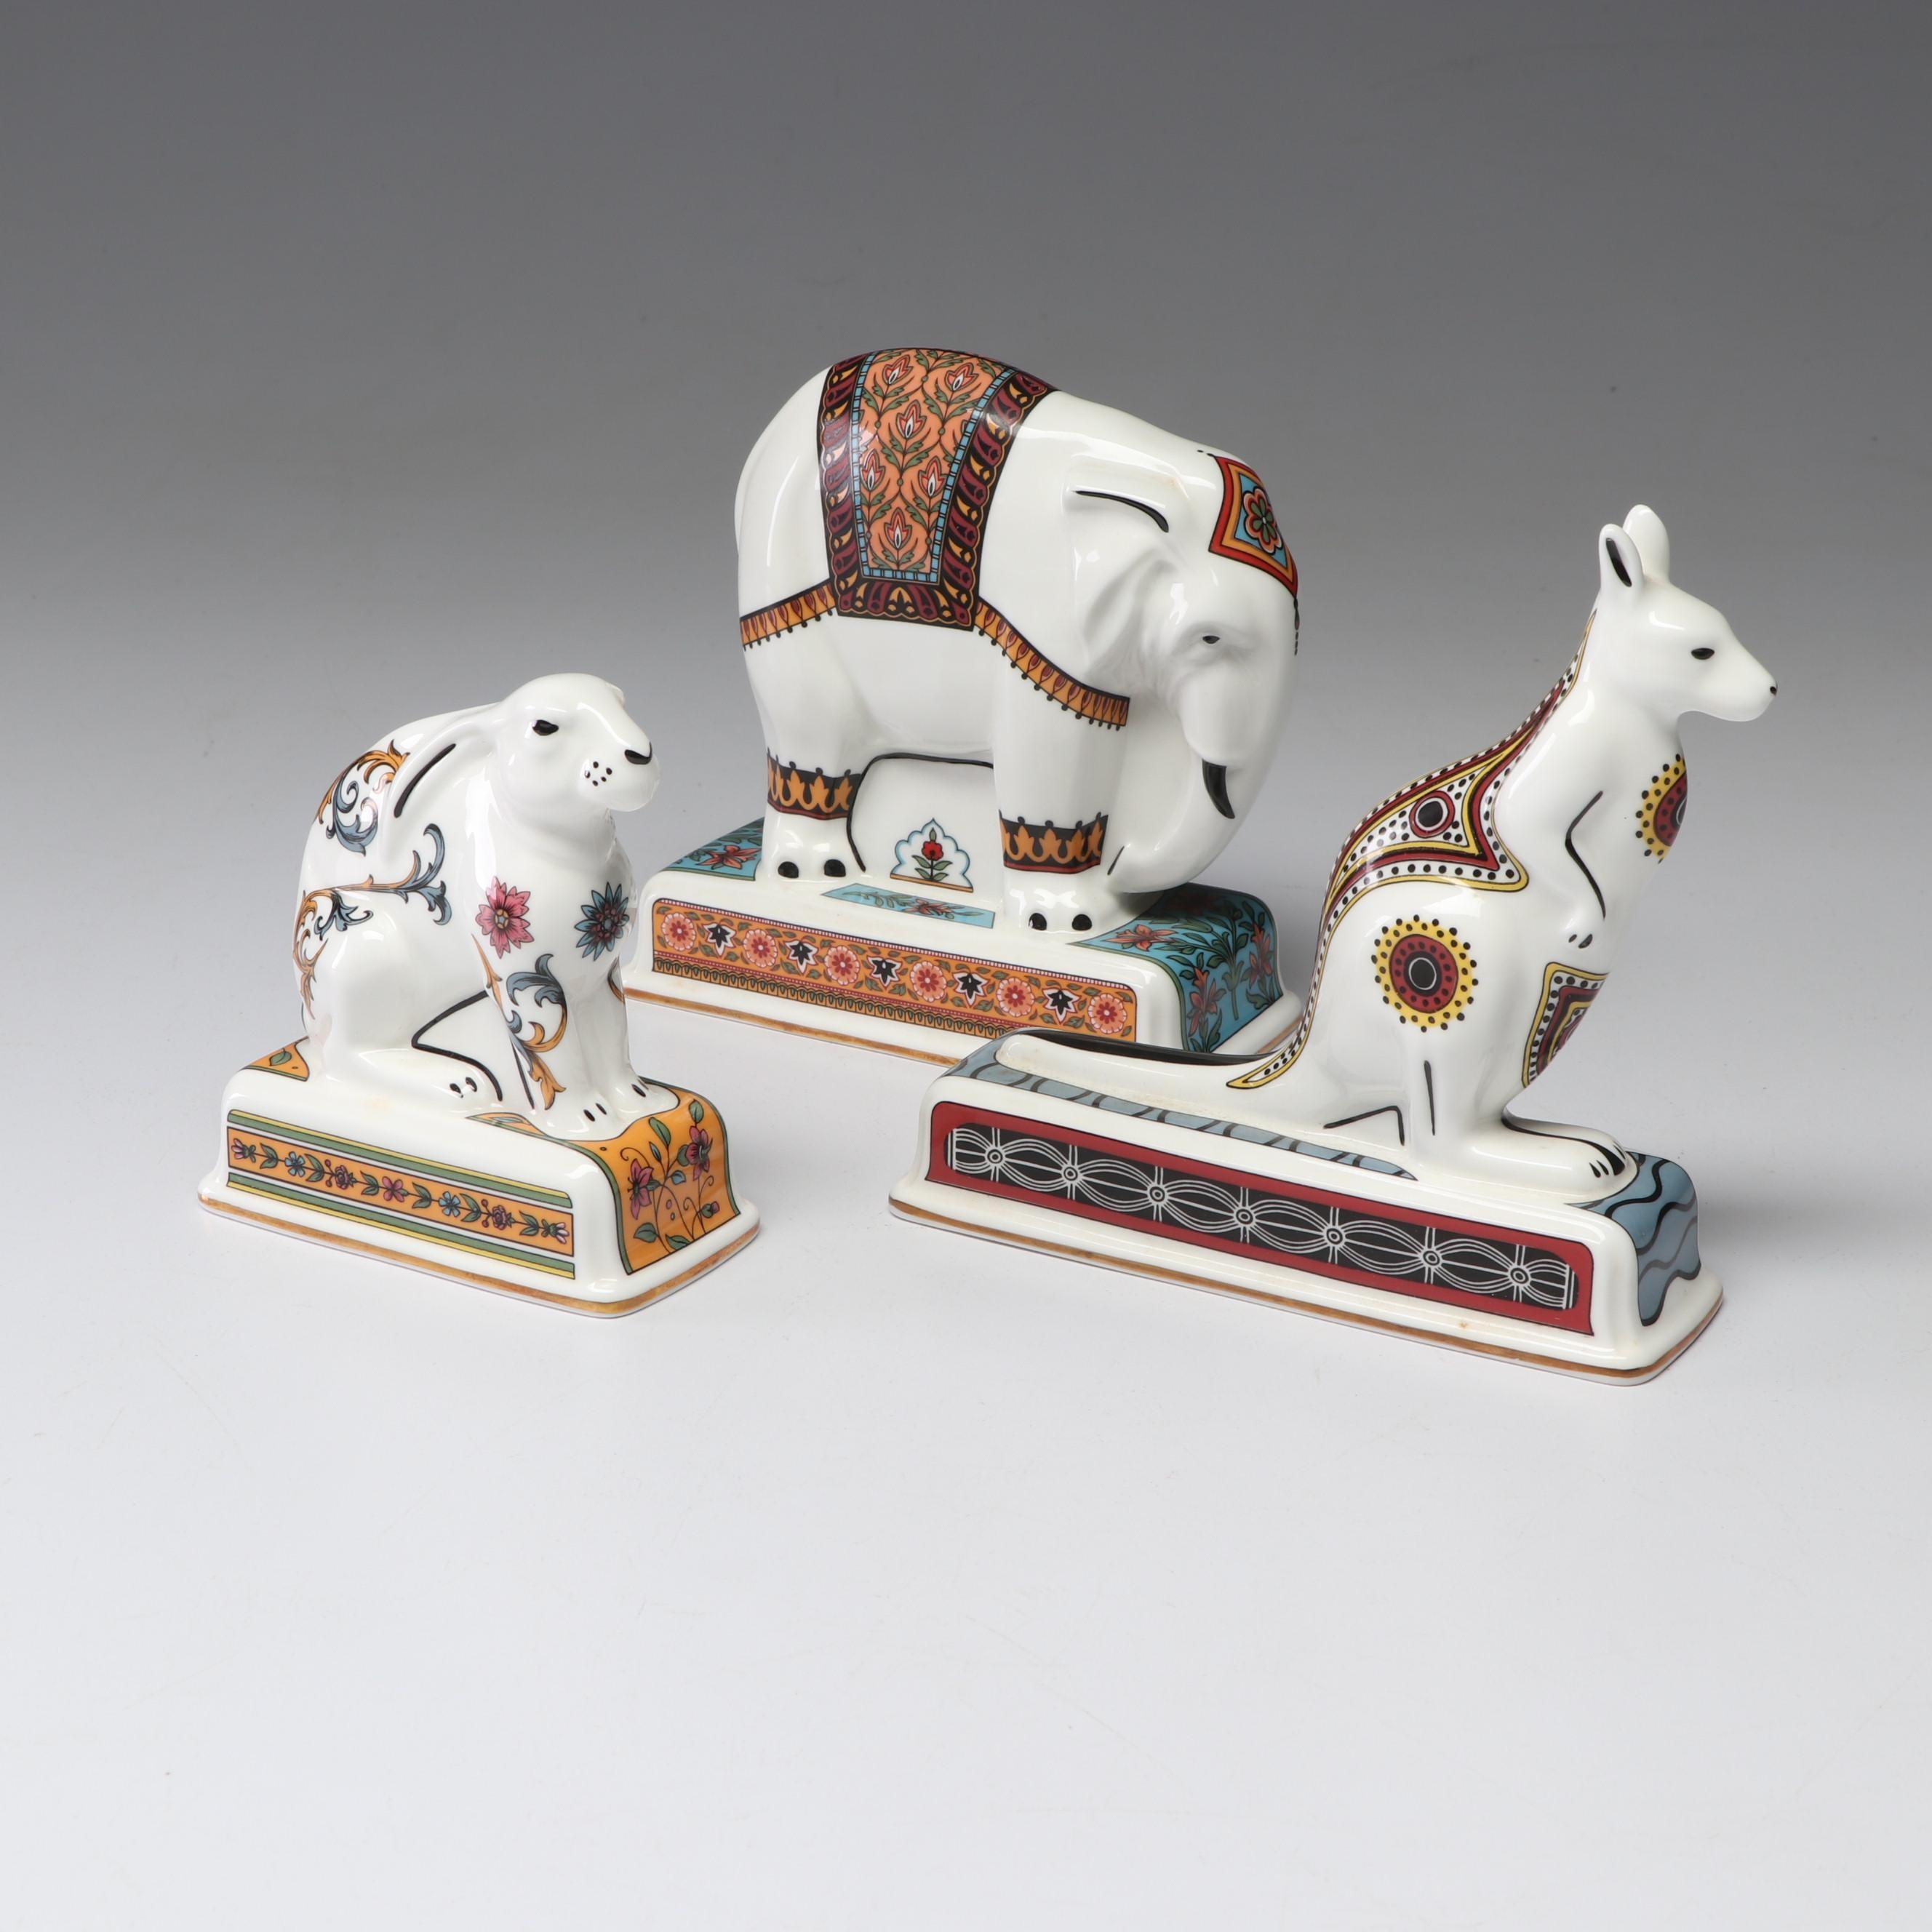 Wedgwood Noah's Ark Collection Hare, Elephant, and Kangaroo, 1993